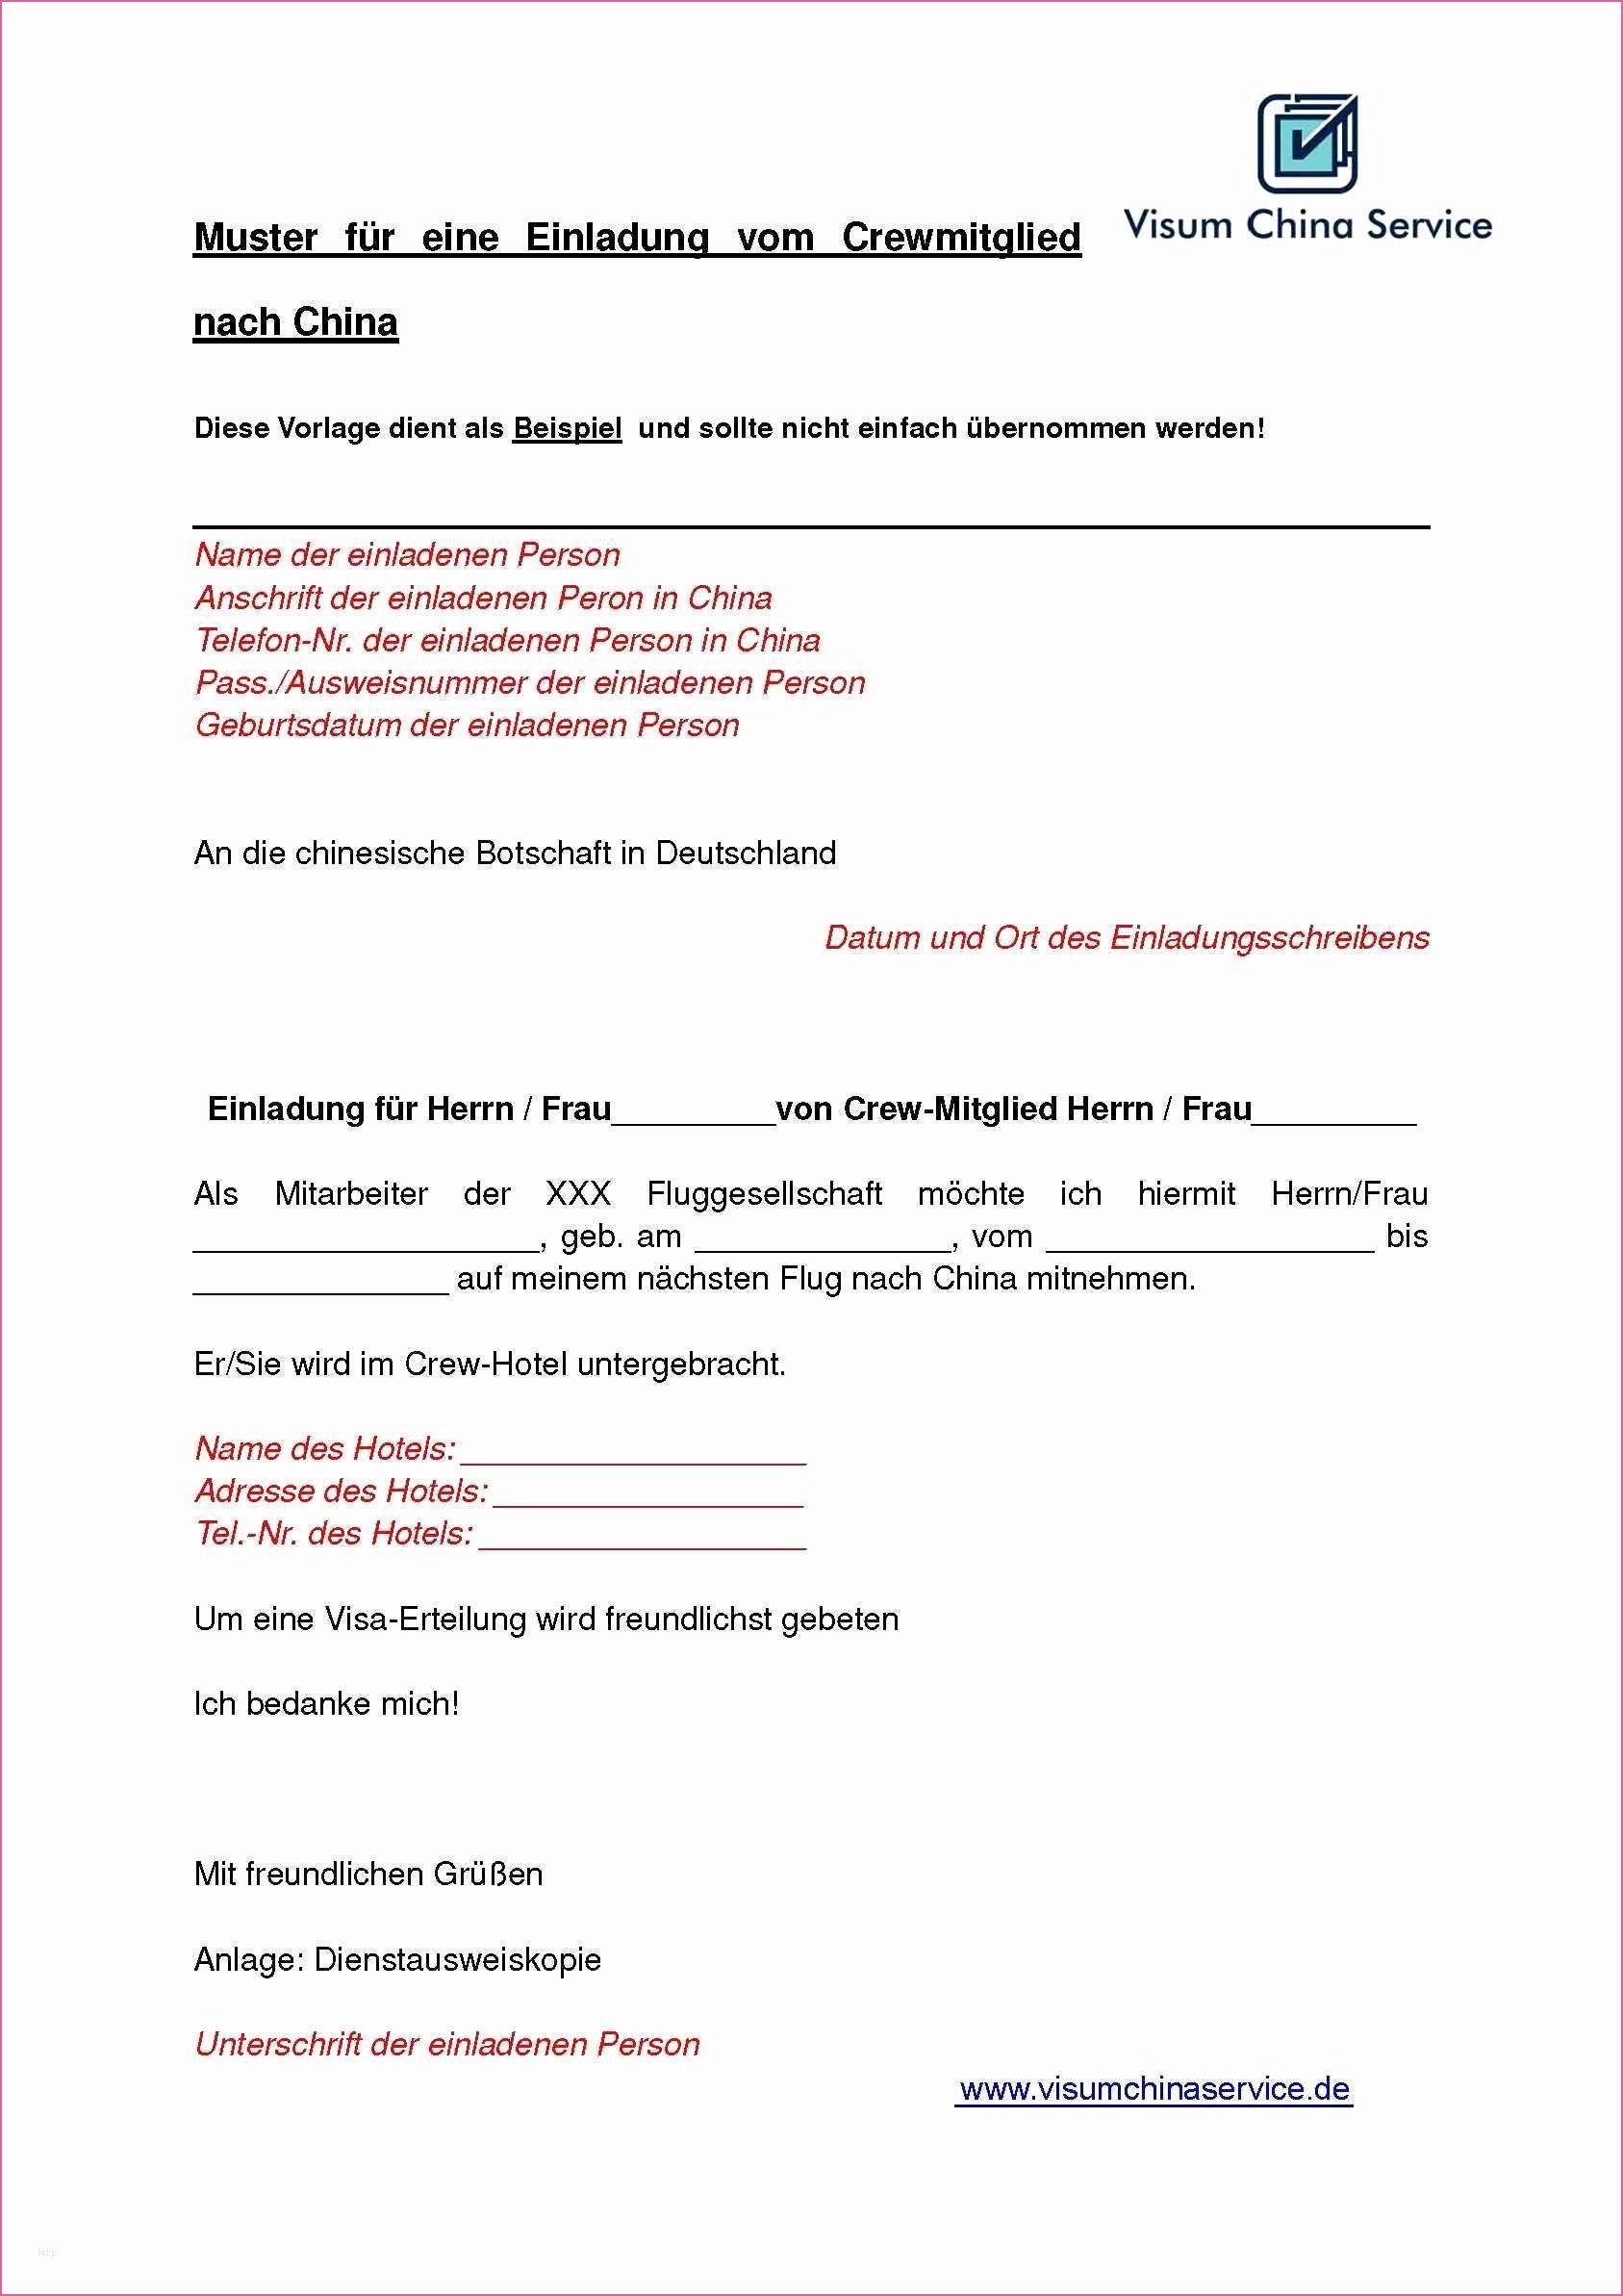 Einladungsschreiben Visum Muster Privat Einladungsschreiben Visum Muster Privat Einladungsschreiben Visum In 2020 Christmas Party Invitations Invitations Lettering